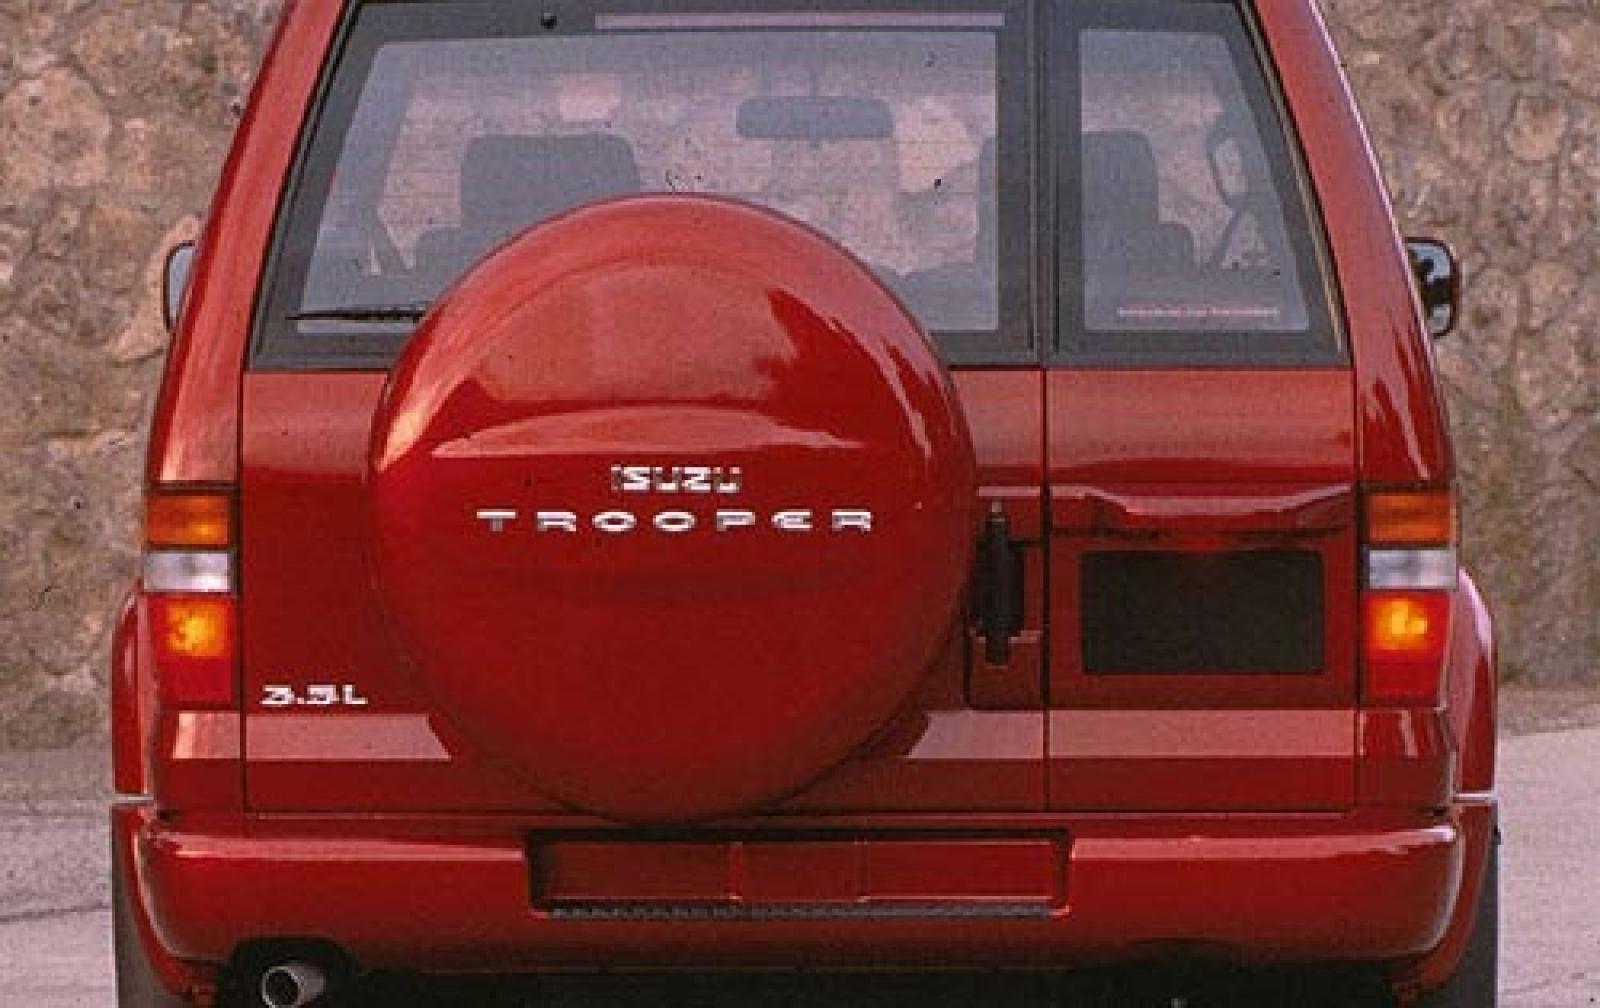 1999 isuzu trooper - 1600px image #6